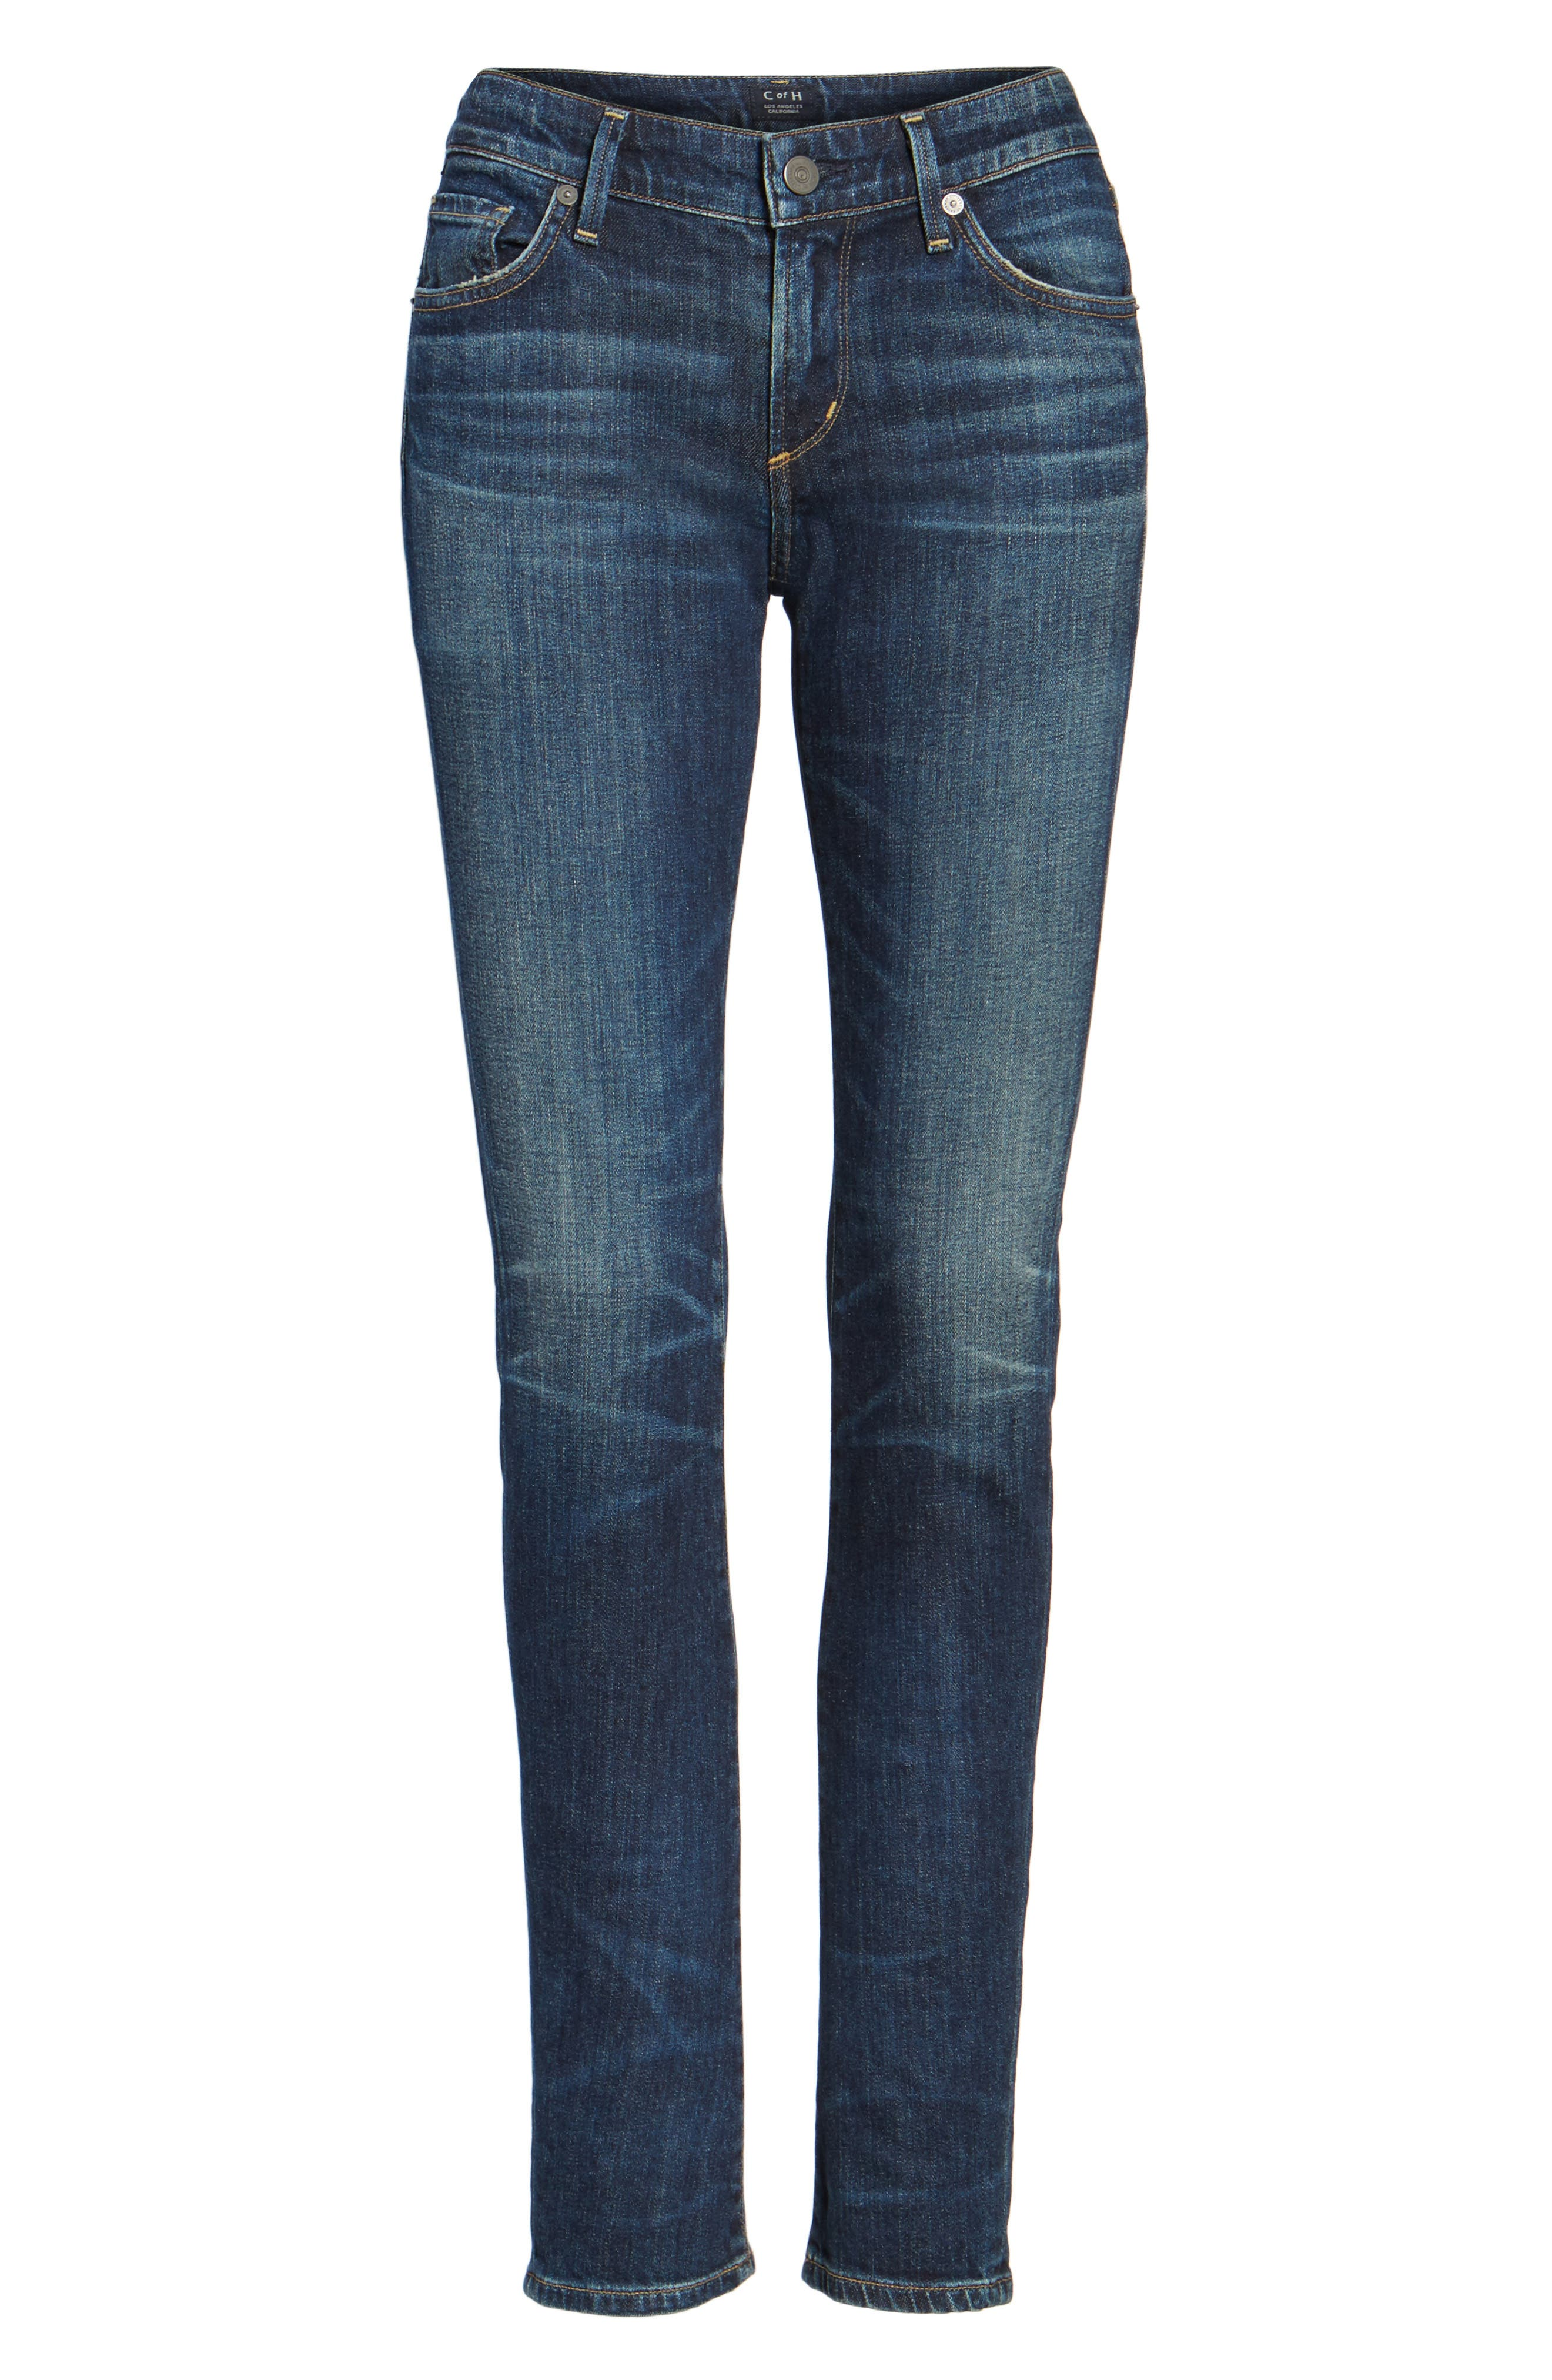 'Racer' Whiskered Skinny Jeans,                             Alternate thumbnail 2, color,                             PATINA